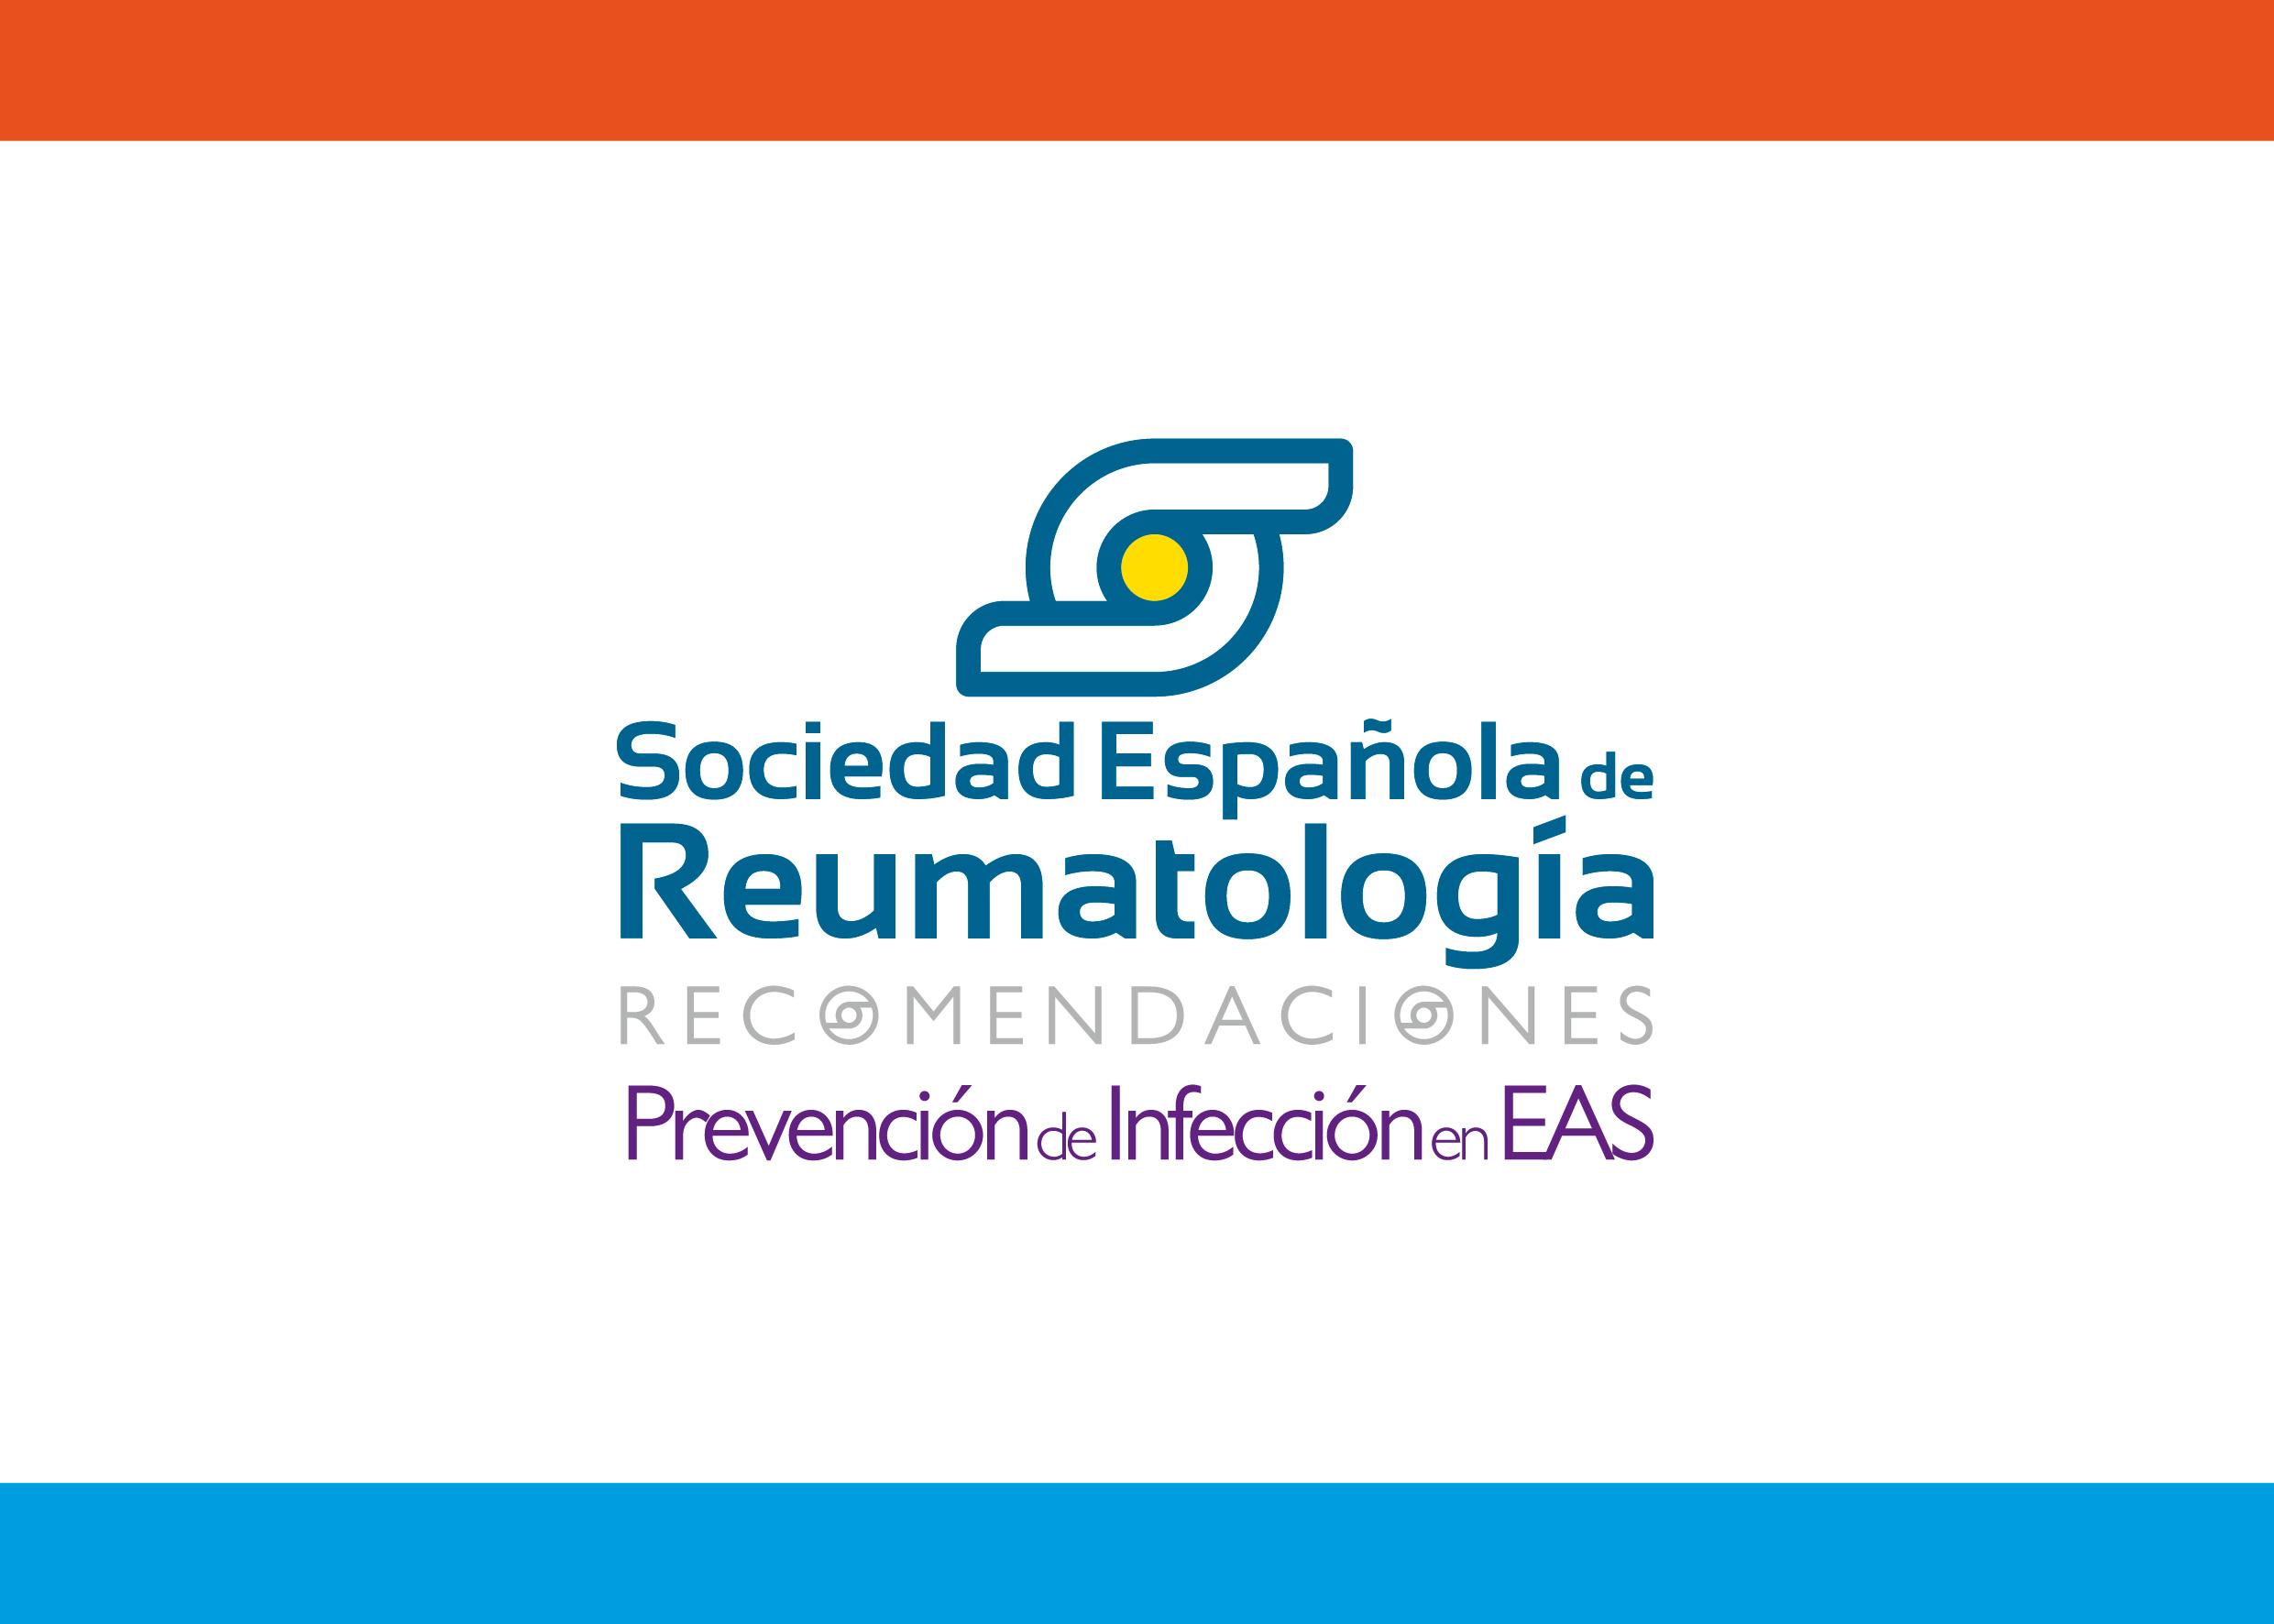 6562018_Logos recomendaciones EAS_v01